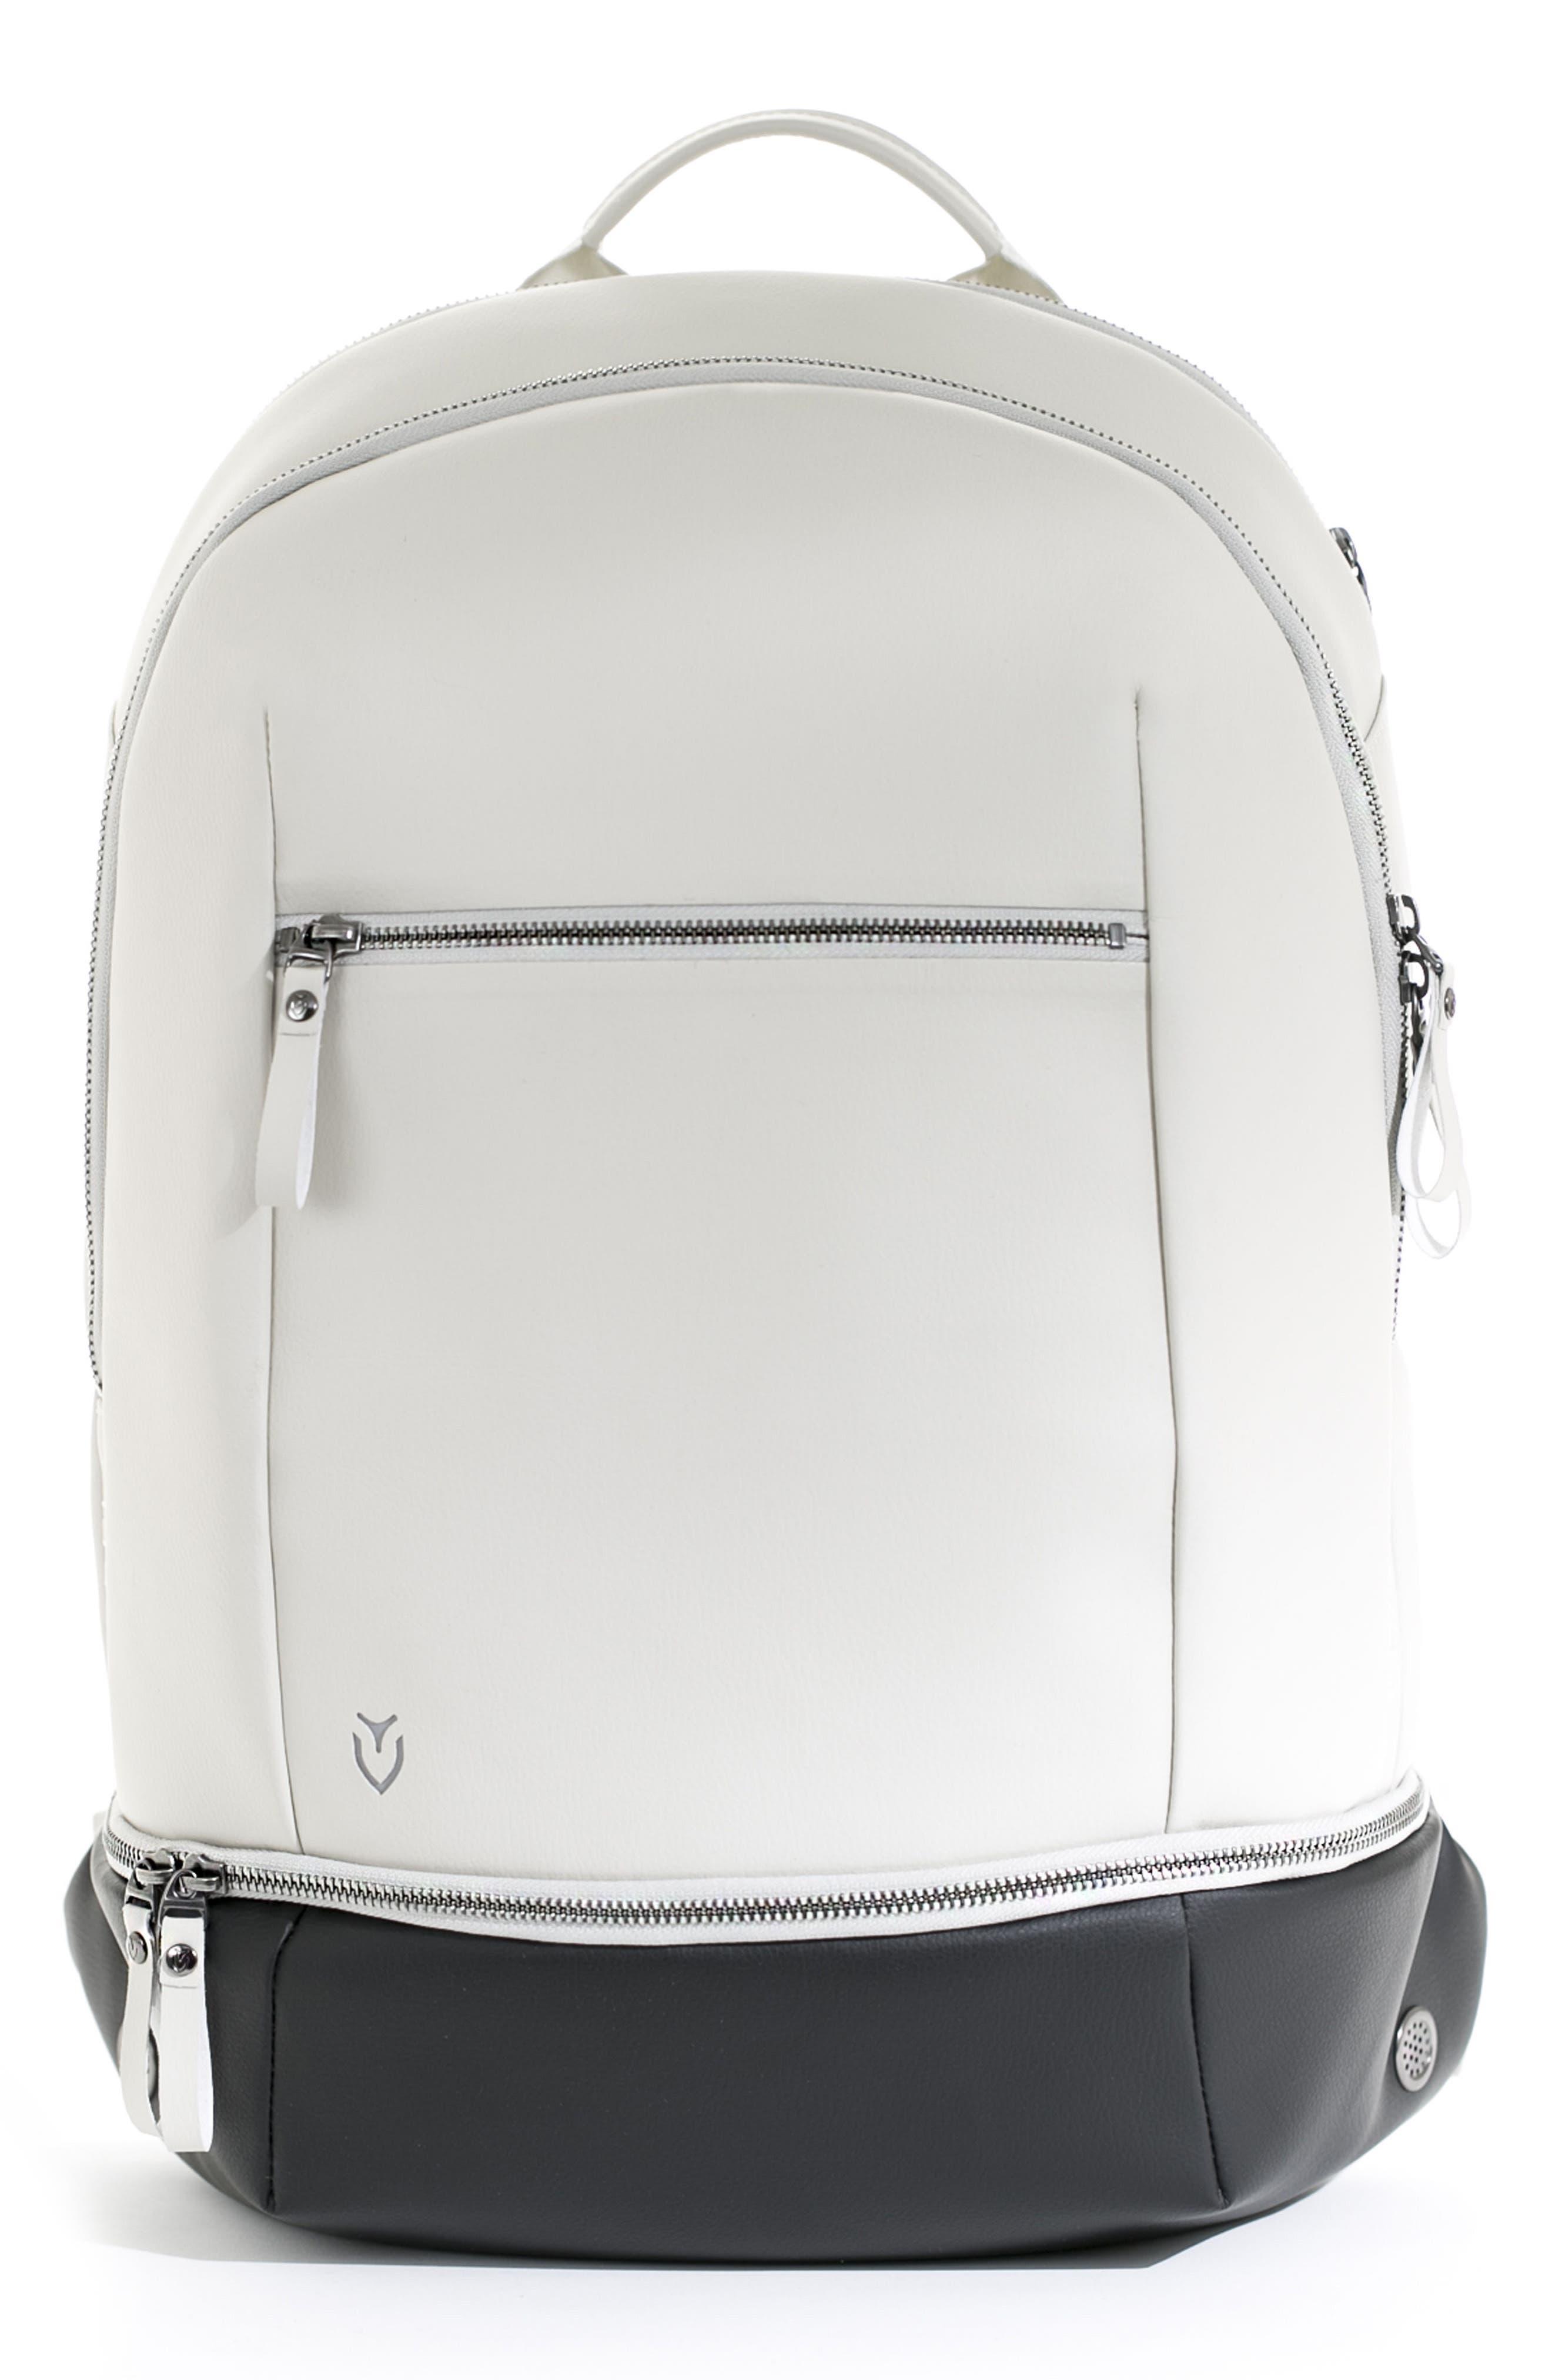 Vessel Signature Backpack